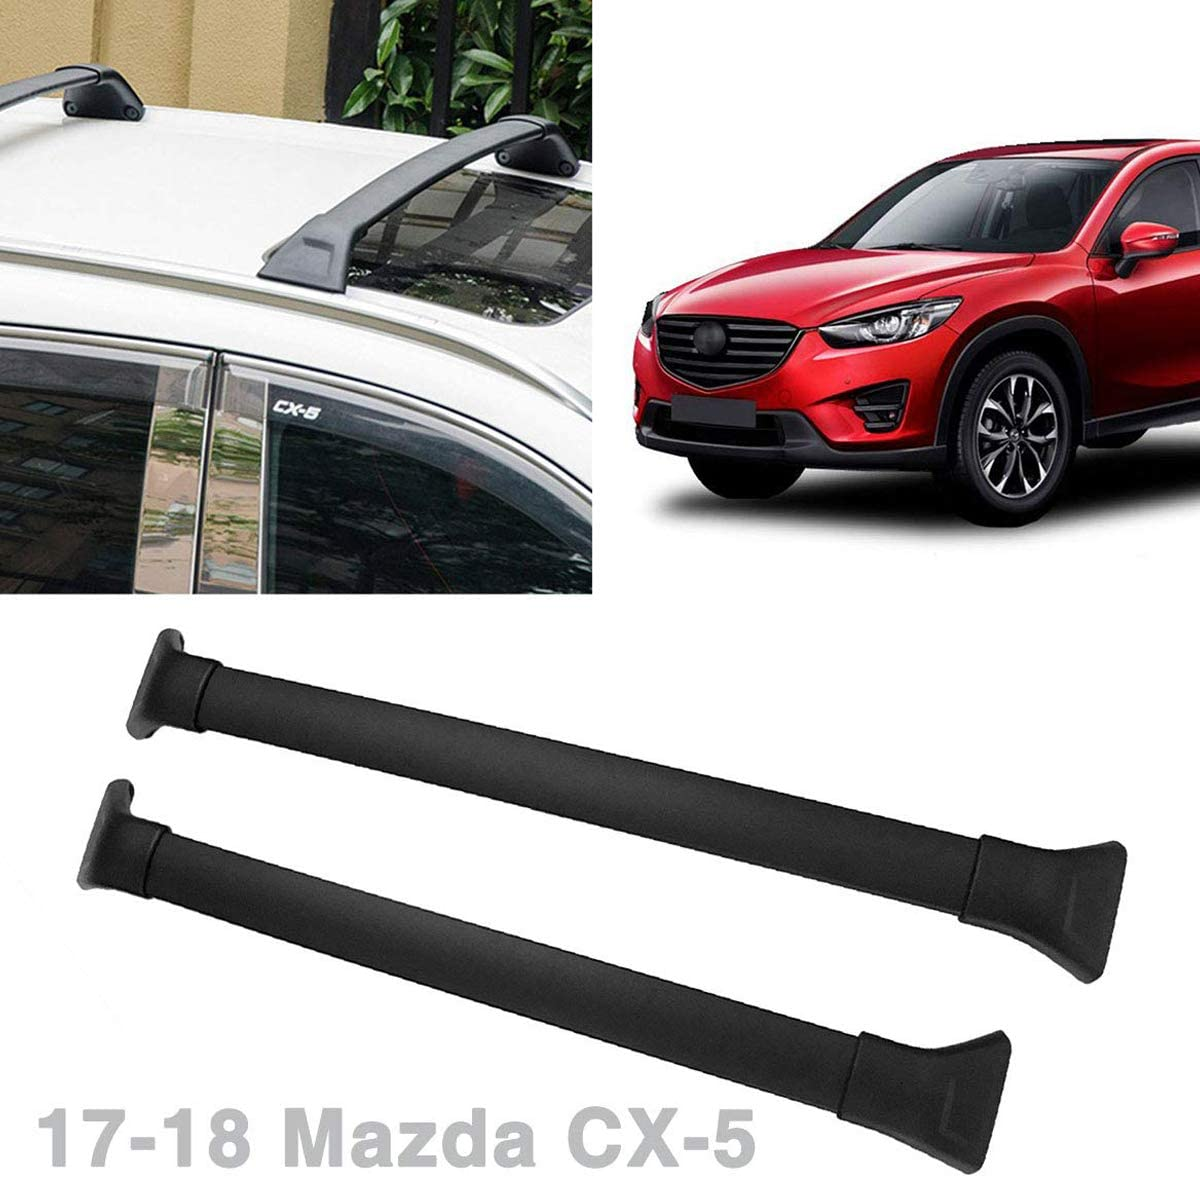 Mazda 17-18 CX-5 CX5 Black Roof Top Cross Bars Crossbars Rack Luggage Carrier